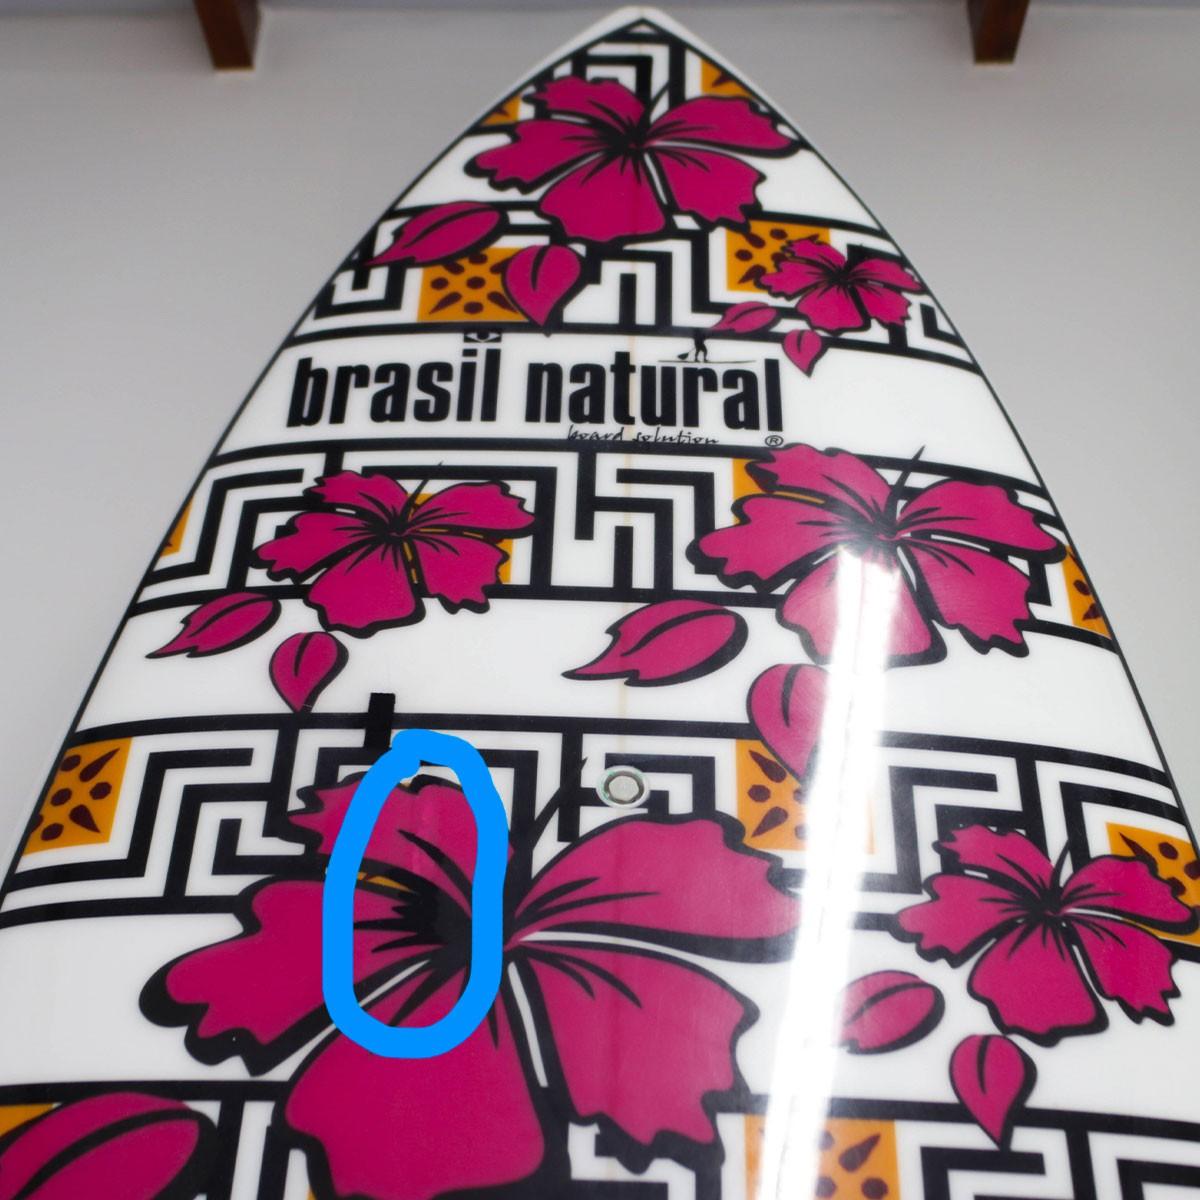 Prancha de Stand up Paddle 10 pés fibra Floral Rosa + Kit remada